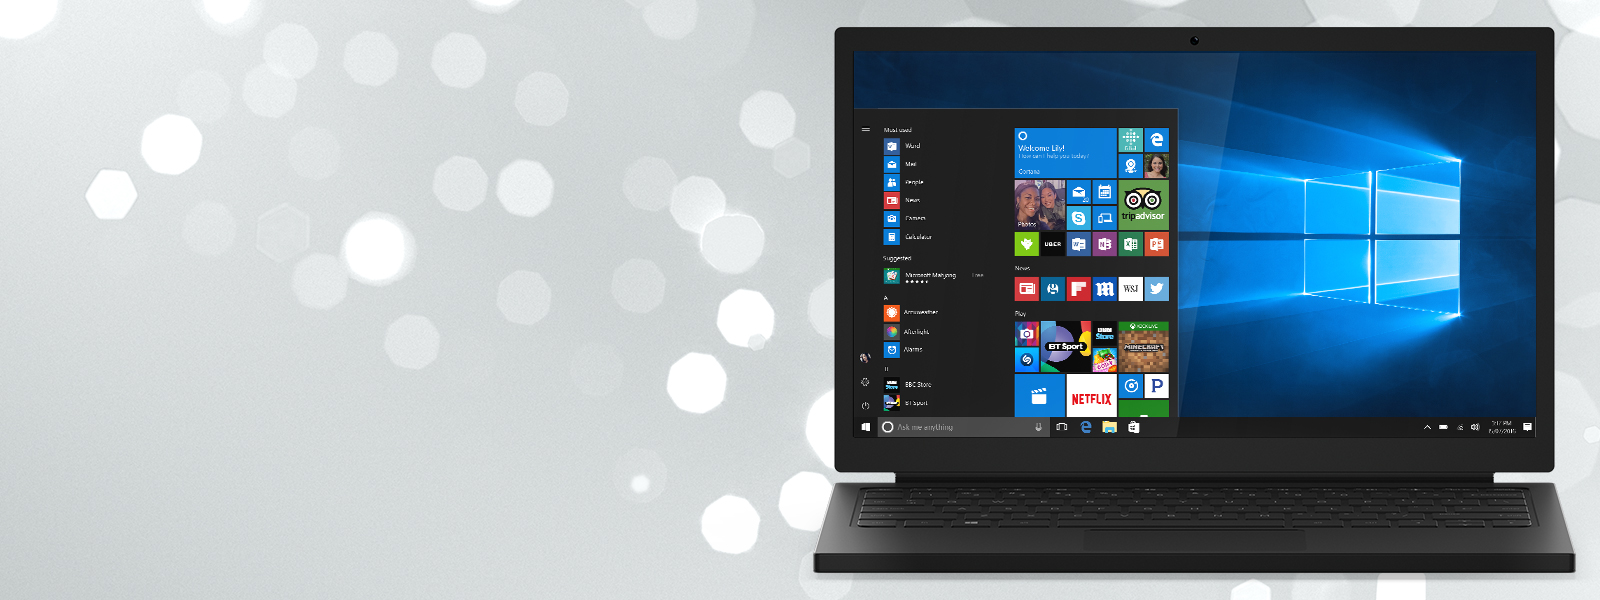 A laptop with a Windows Start screen